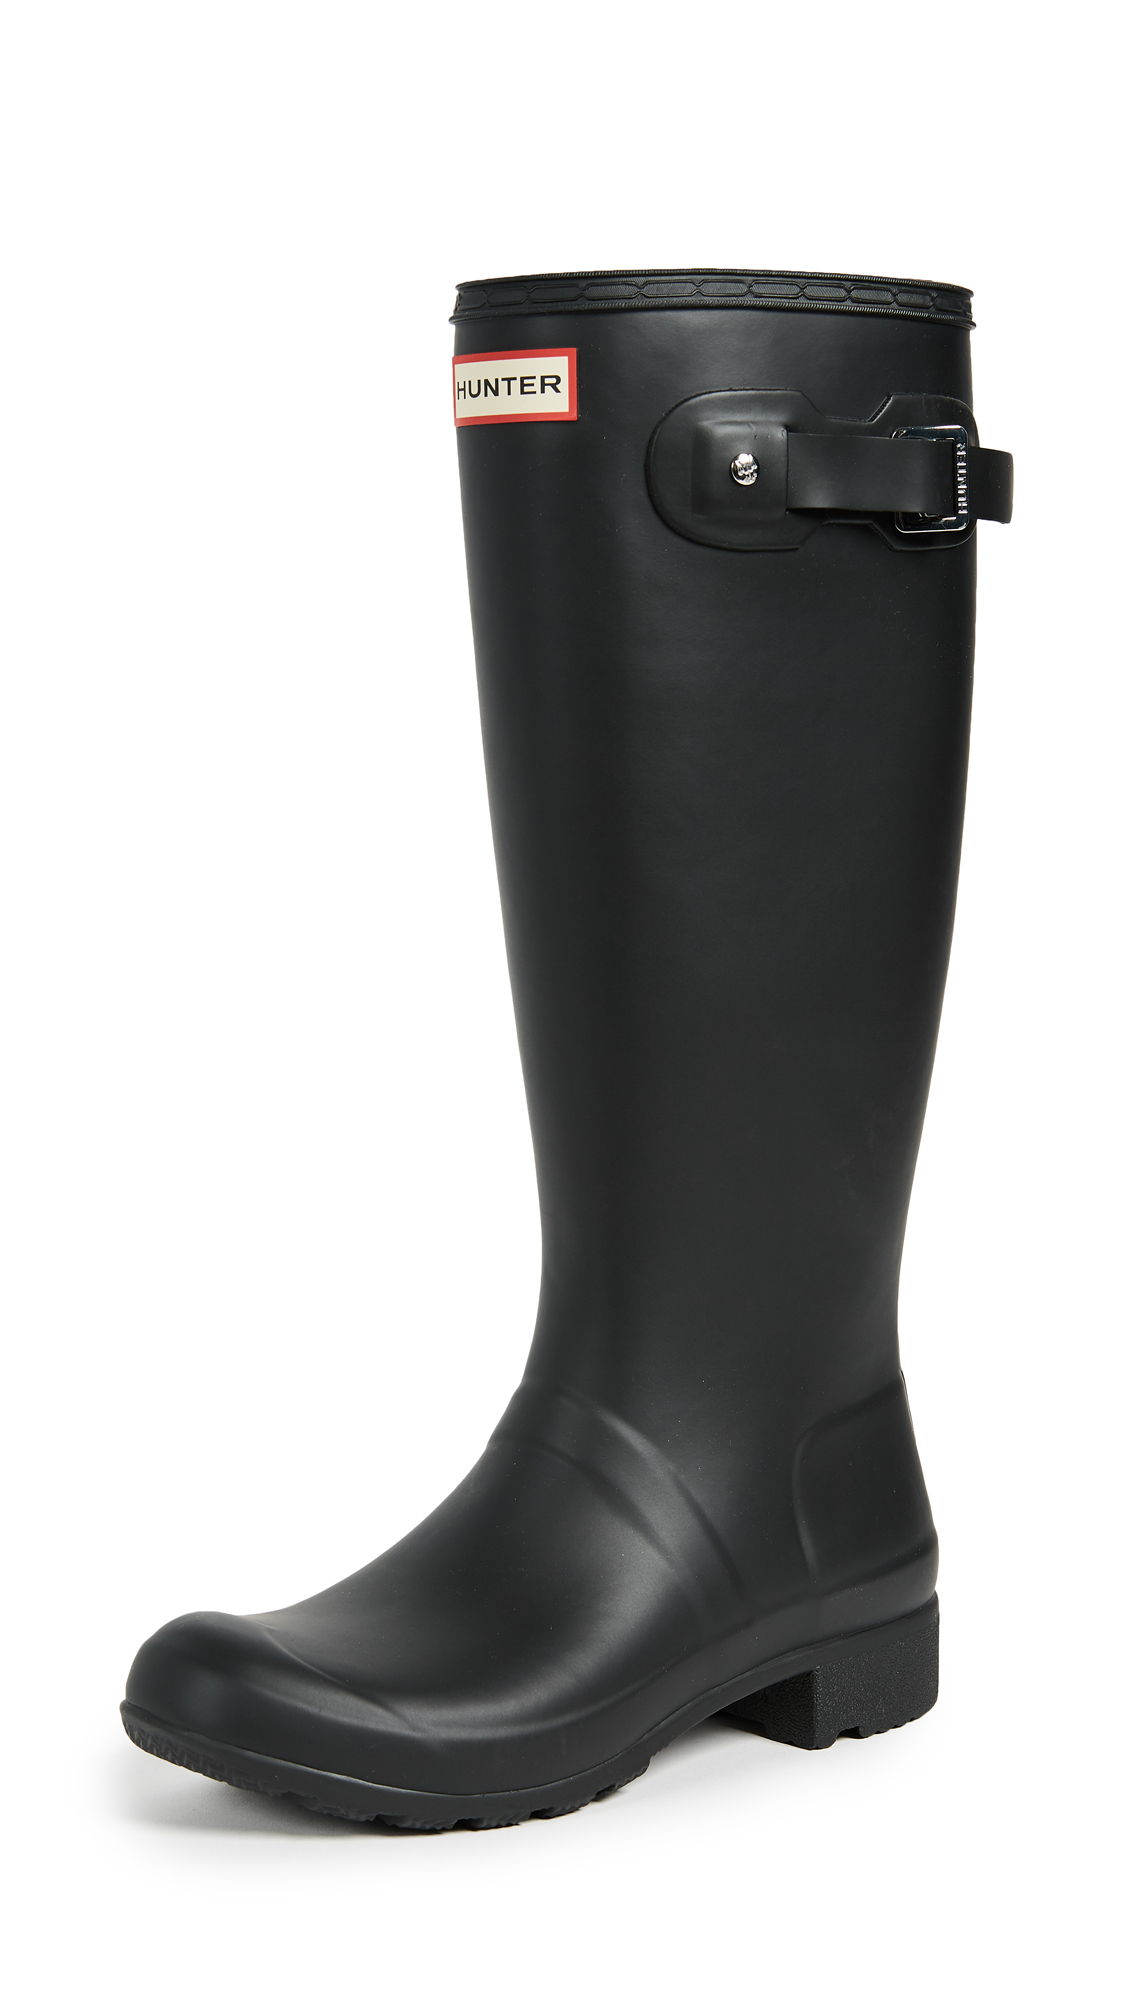 Hunter Boots Original Tour Boots